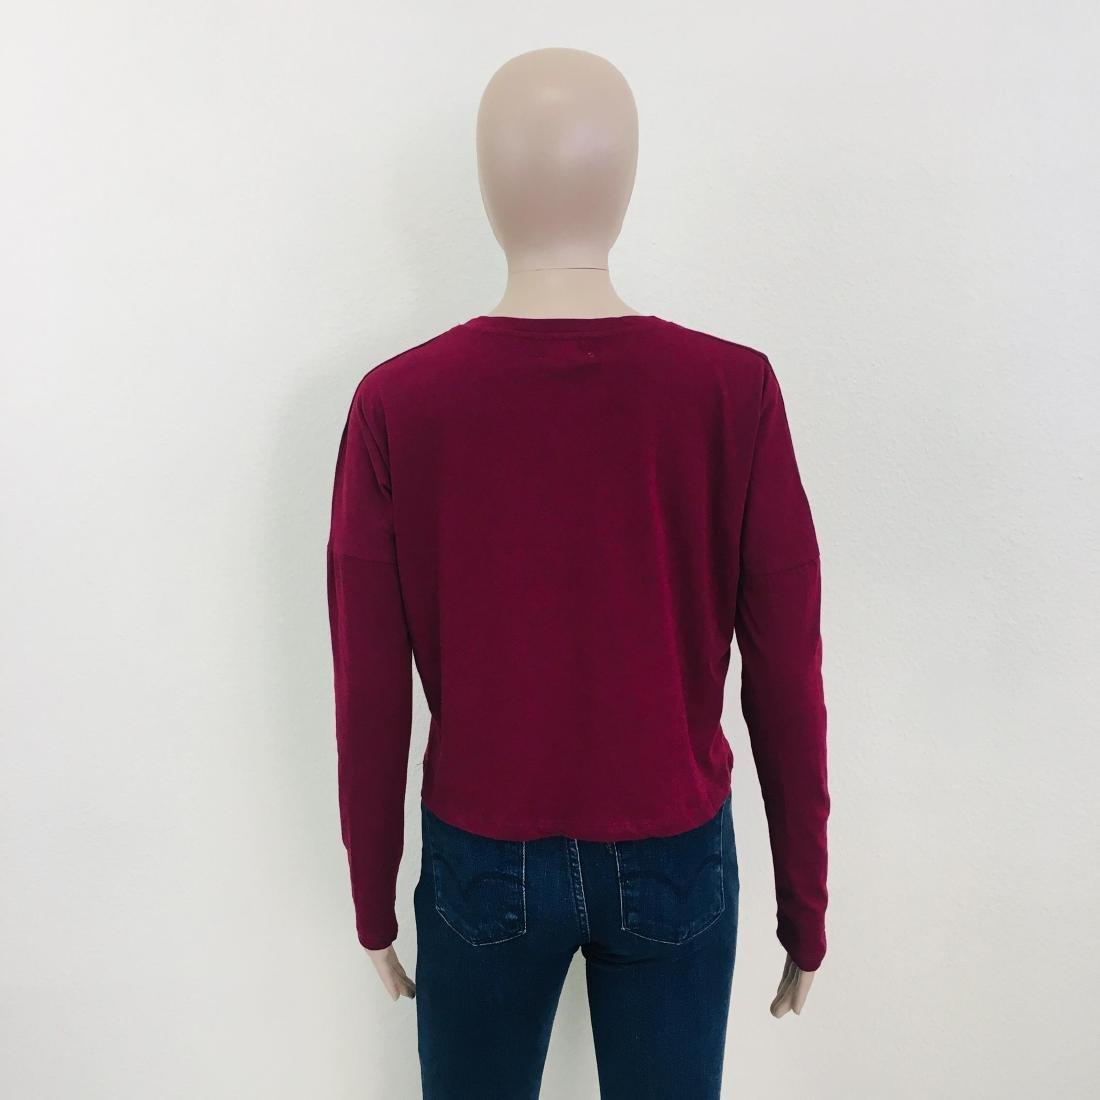 New Women's ZARA Top Blouse Size S - 7